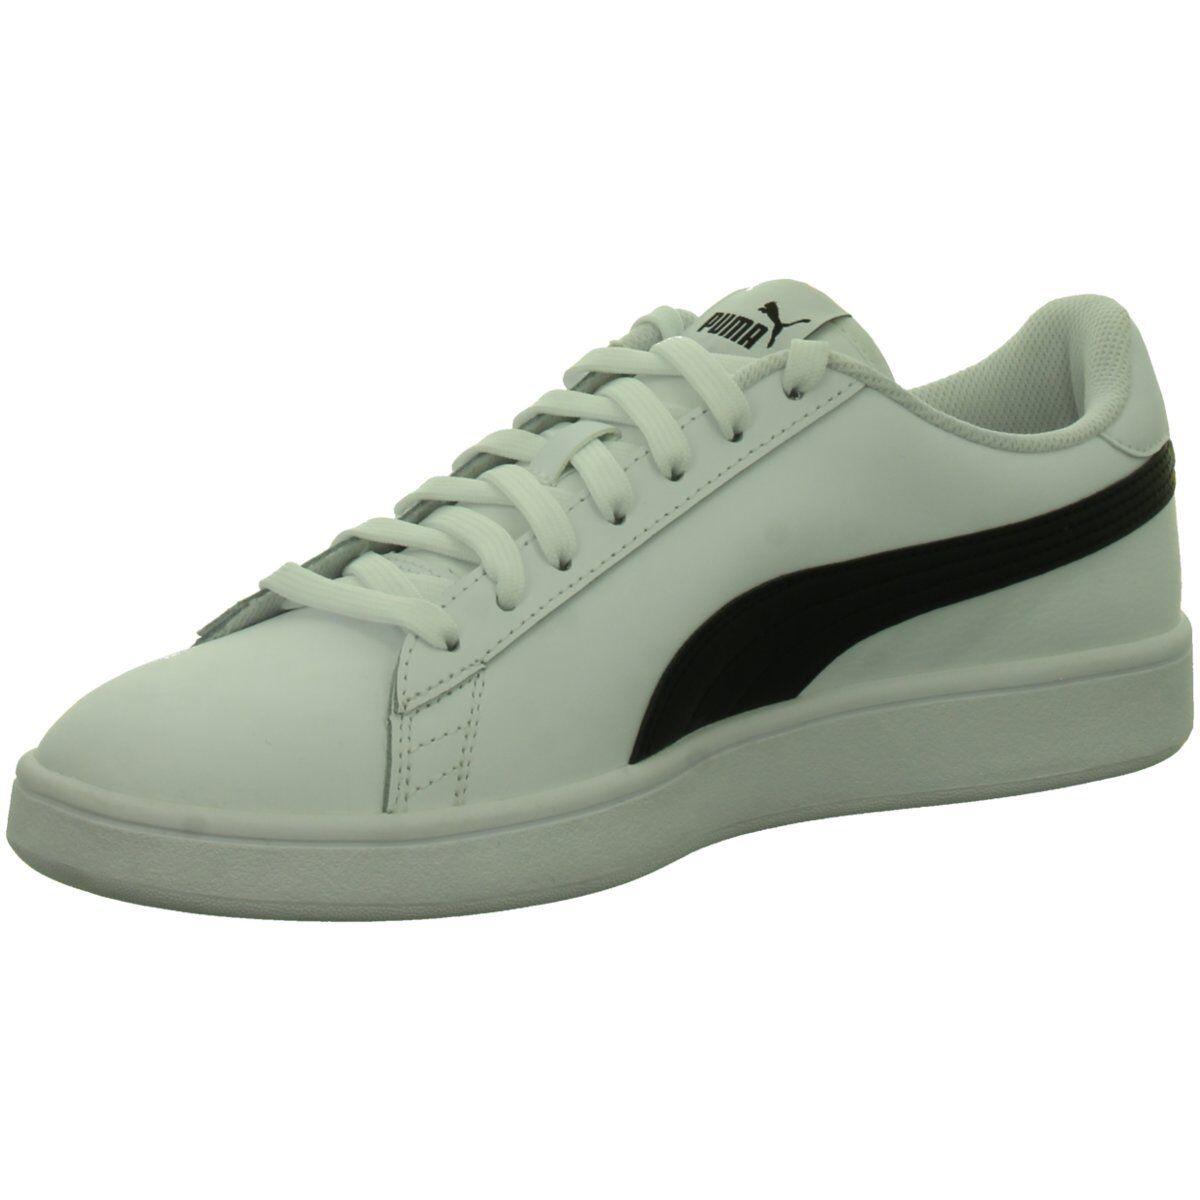 NEU Puma Herren Sneaker Training  Smash v2 L 365215 01 weiß 416456